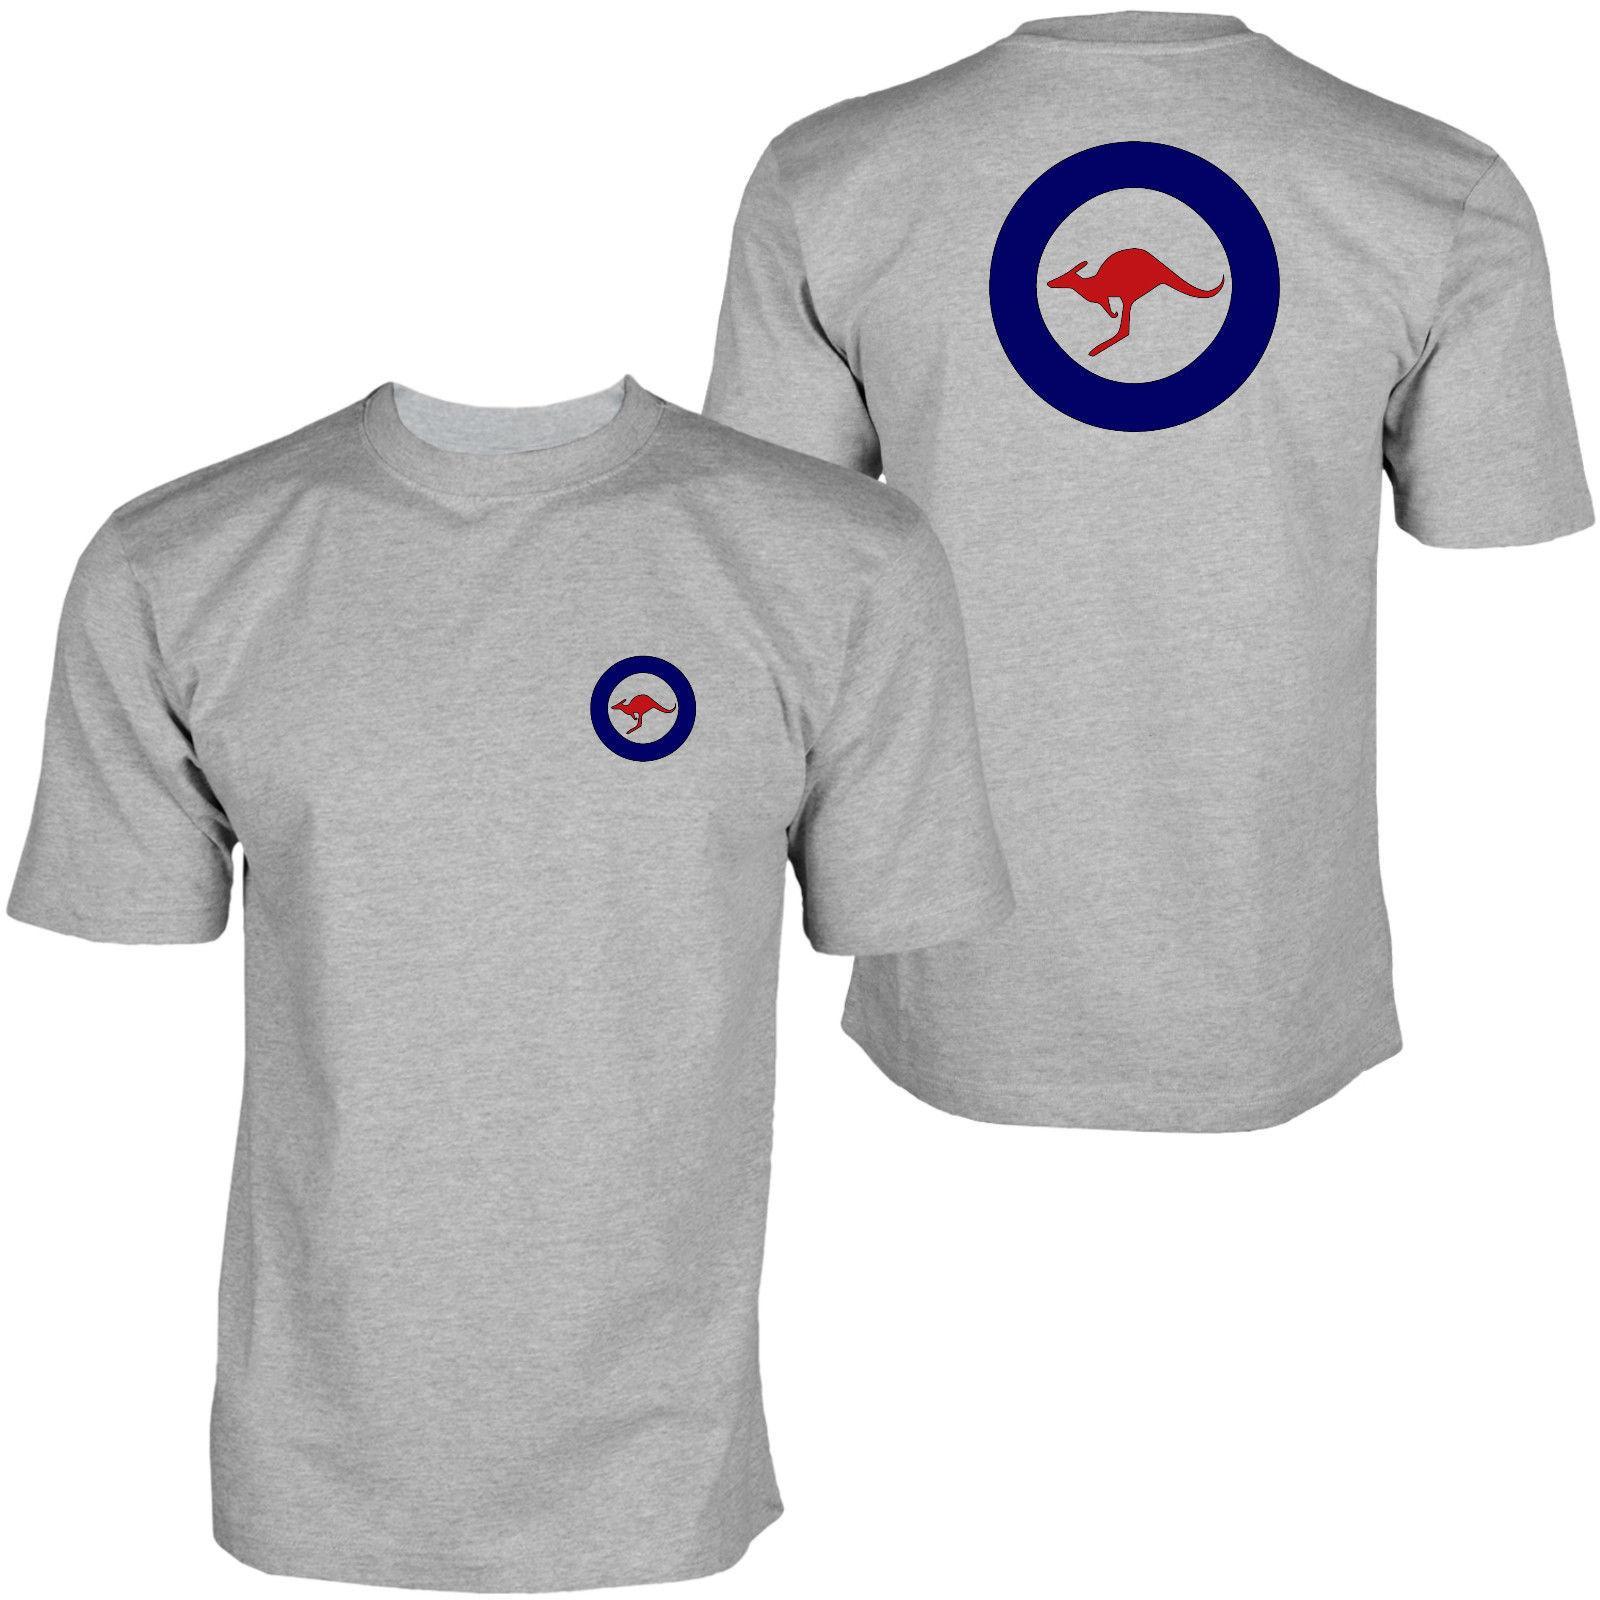 2019 New Australian Airforce Adf Défense hommes T-shirt T-shirt